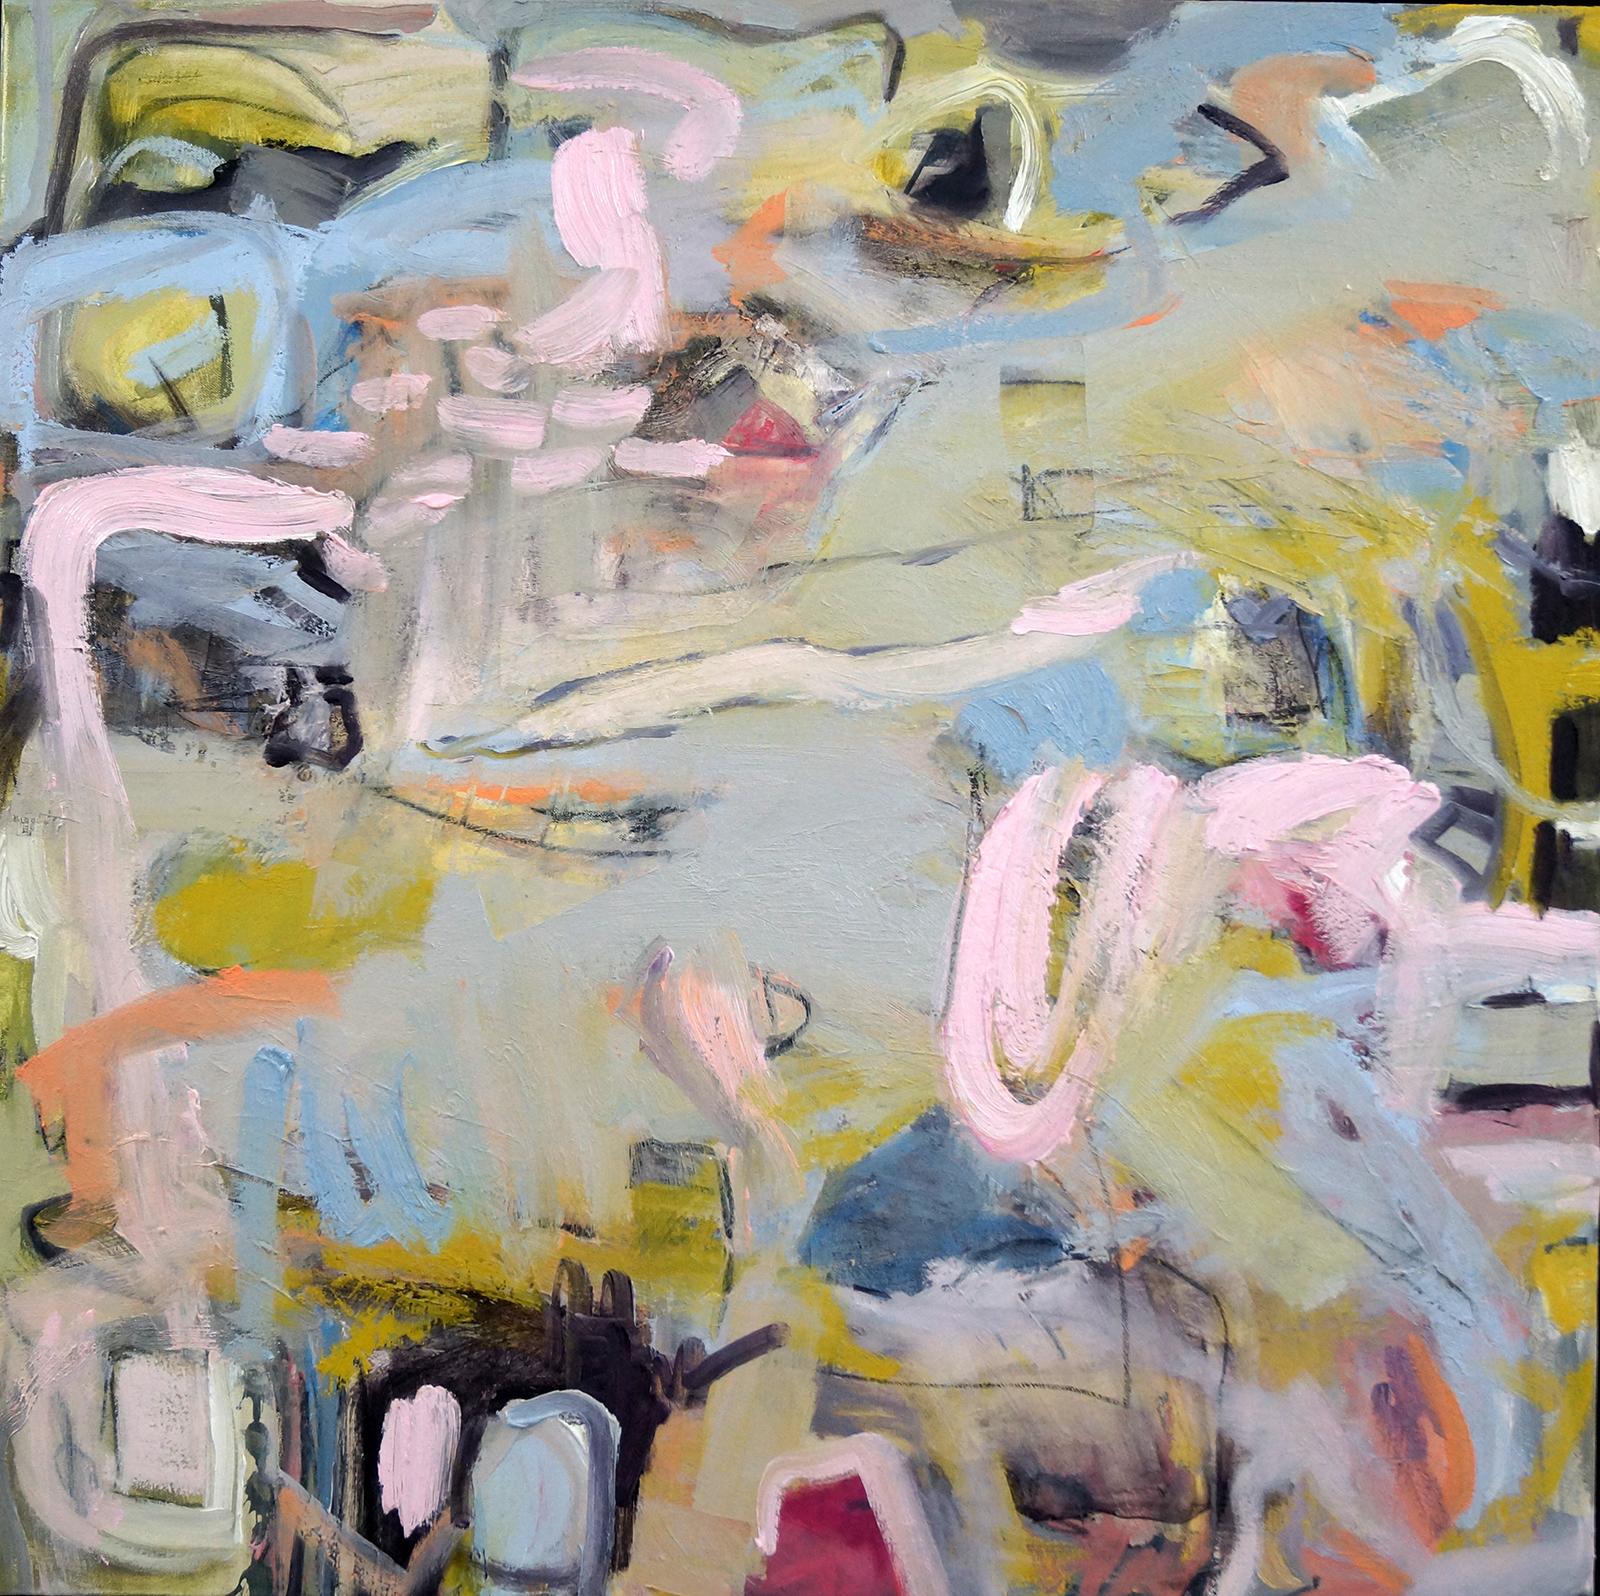 Rhapsody, 36x36, Mixed Media on Canvas